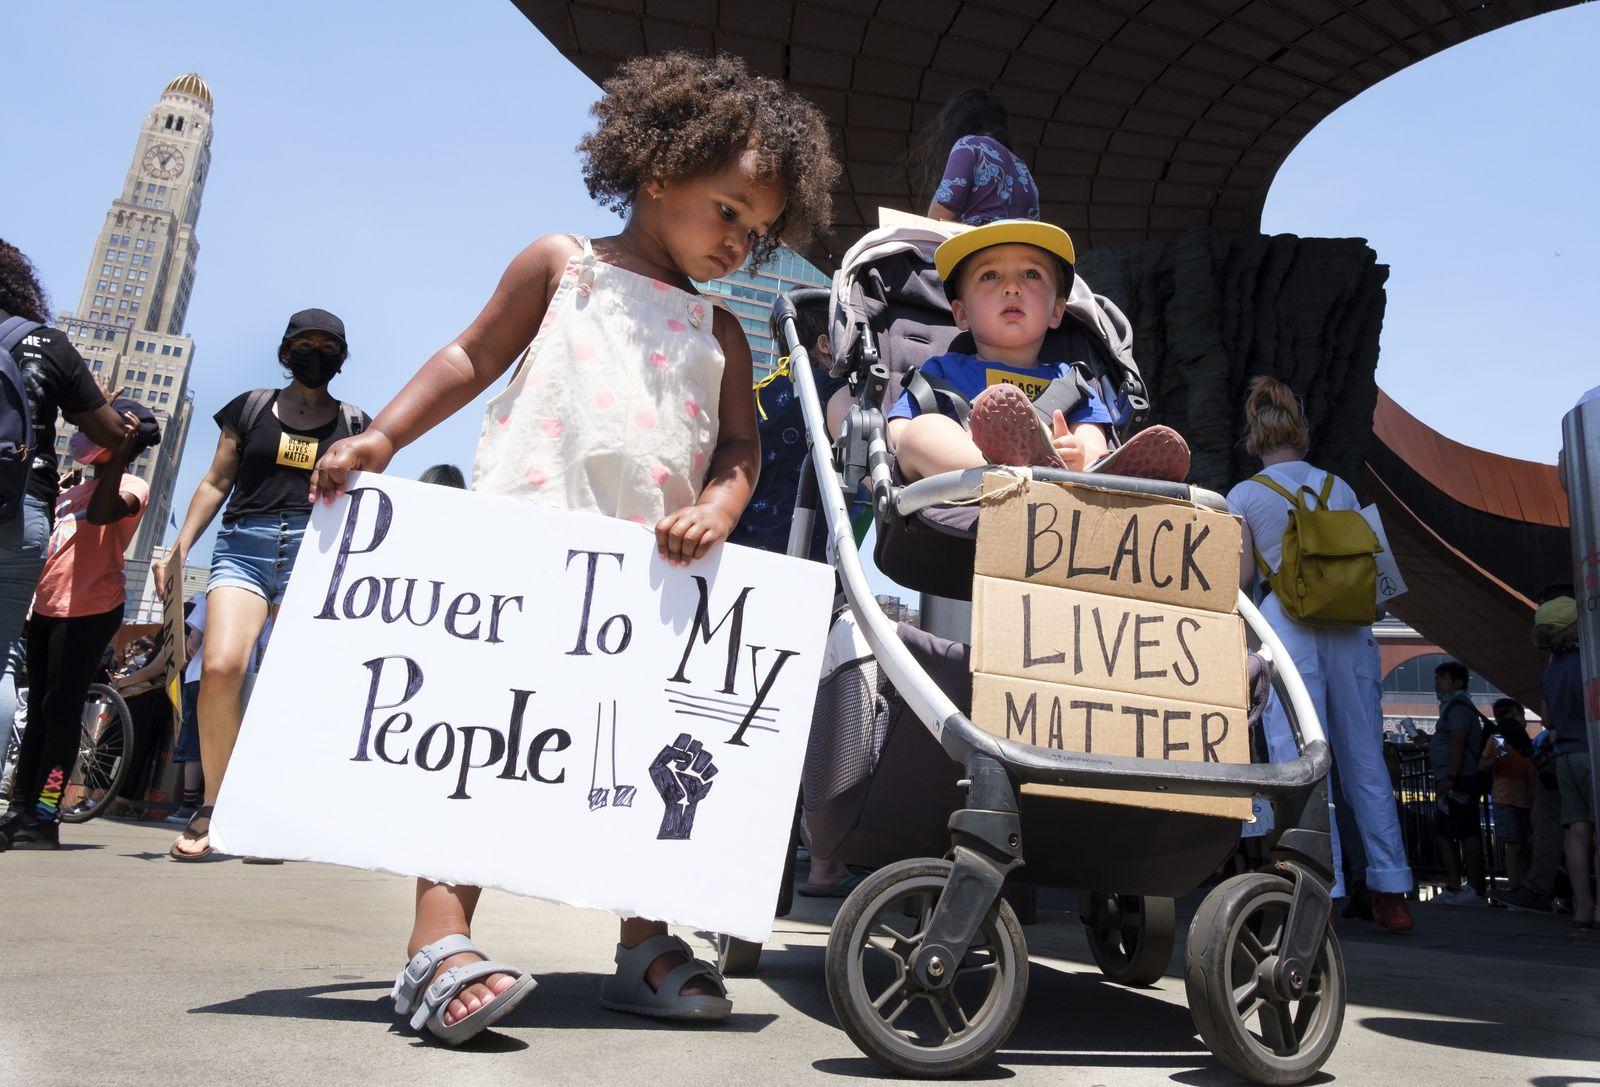 New York Protest Over George Floyd Death, Brooklyn, USA - 09 Jun 2020